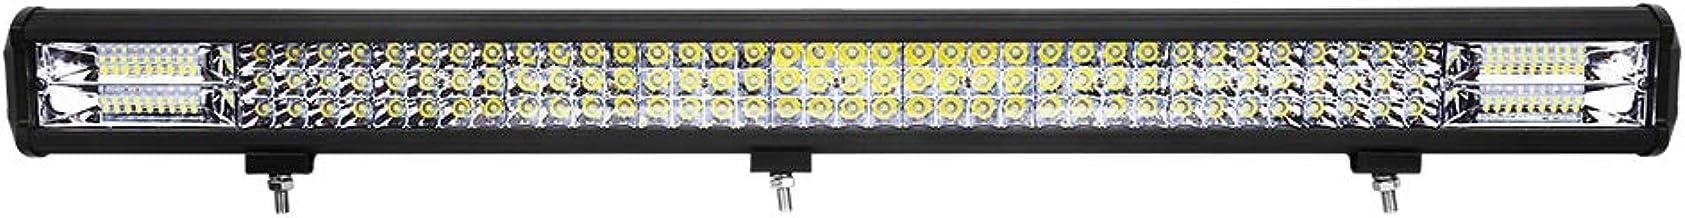 Barra de luz LED Curvada WEISIJI Quad Row